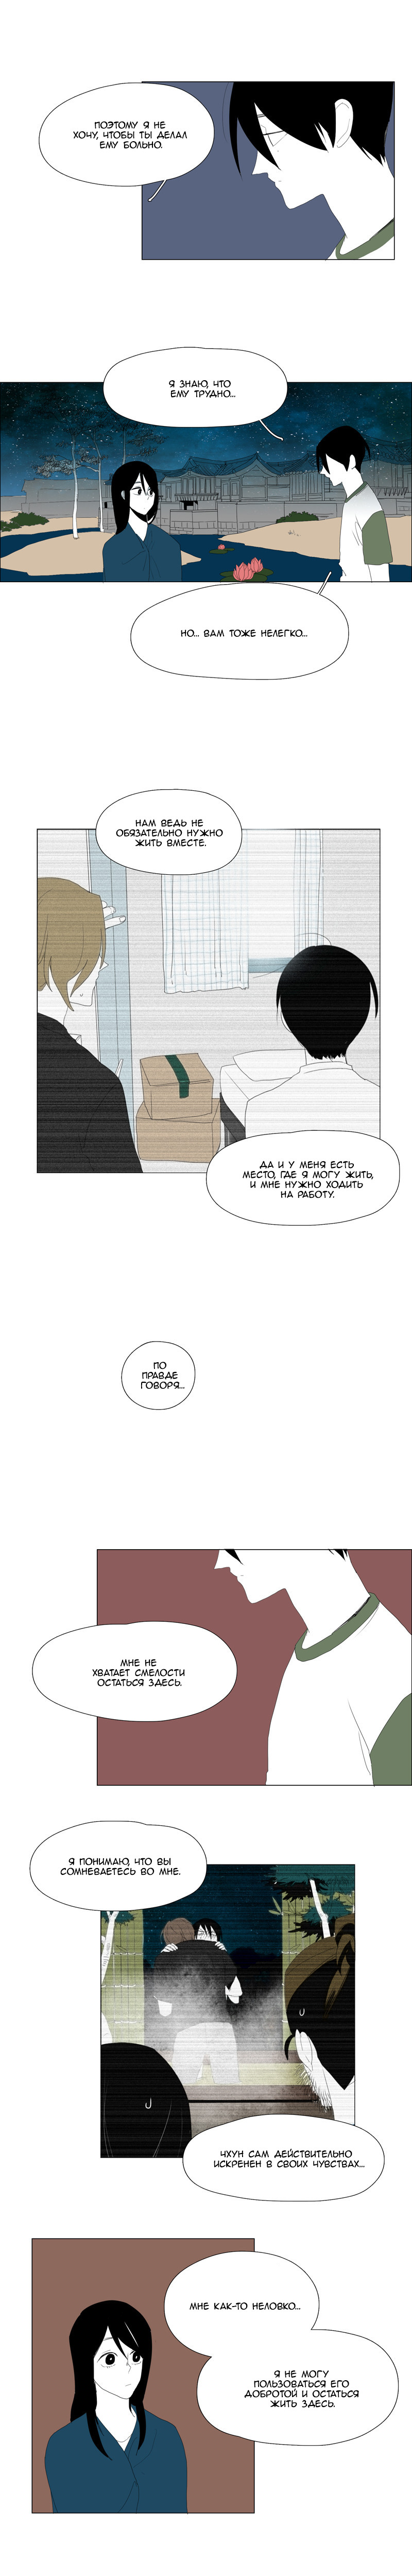 https://r1.ninemanga.com/comics/pic2/33/27873/311923/1477614074905.jpg Page 4